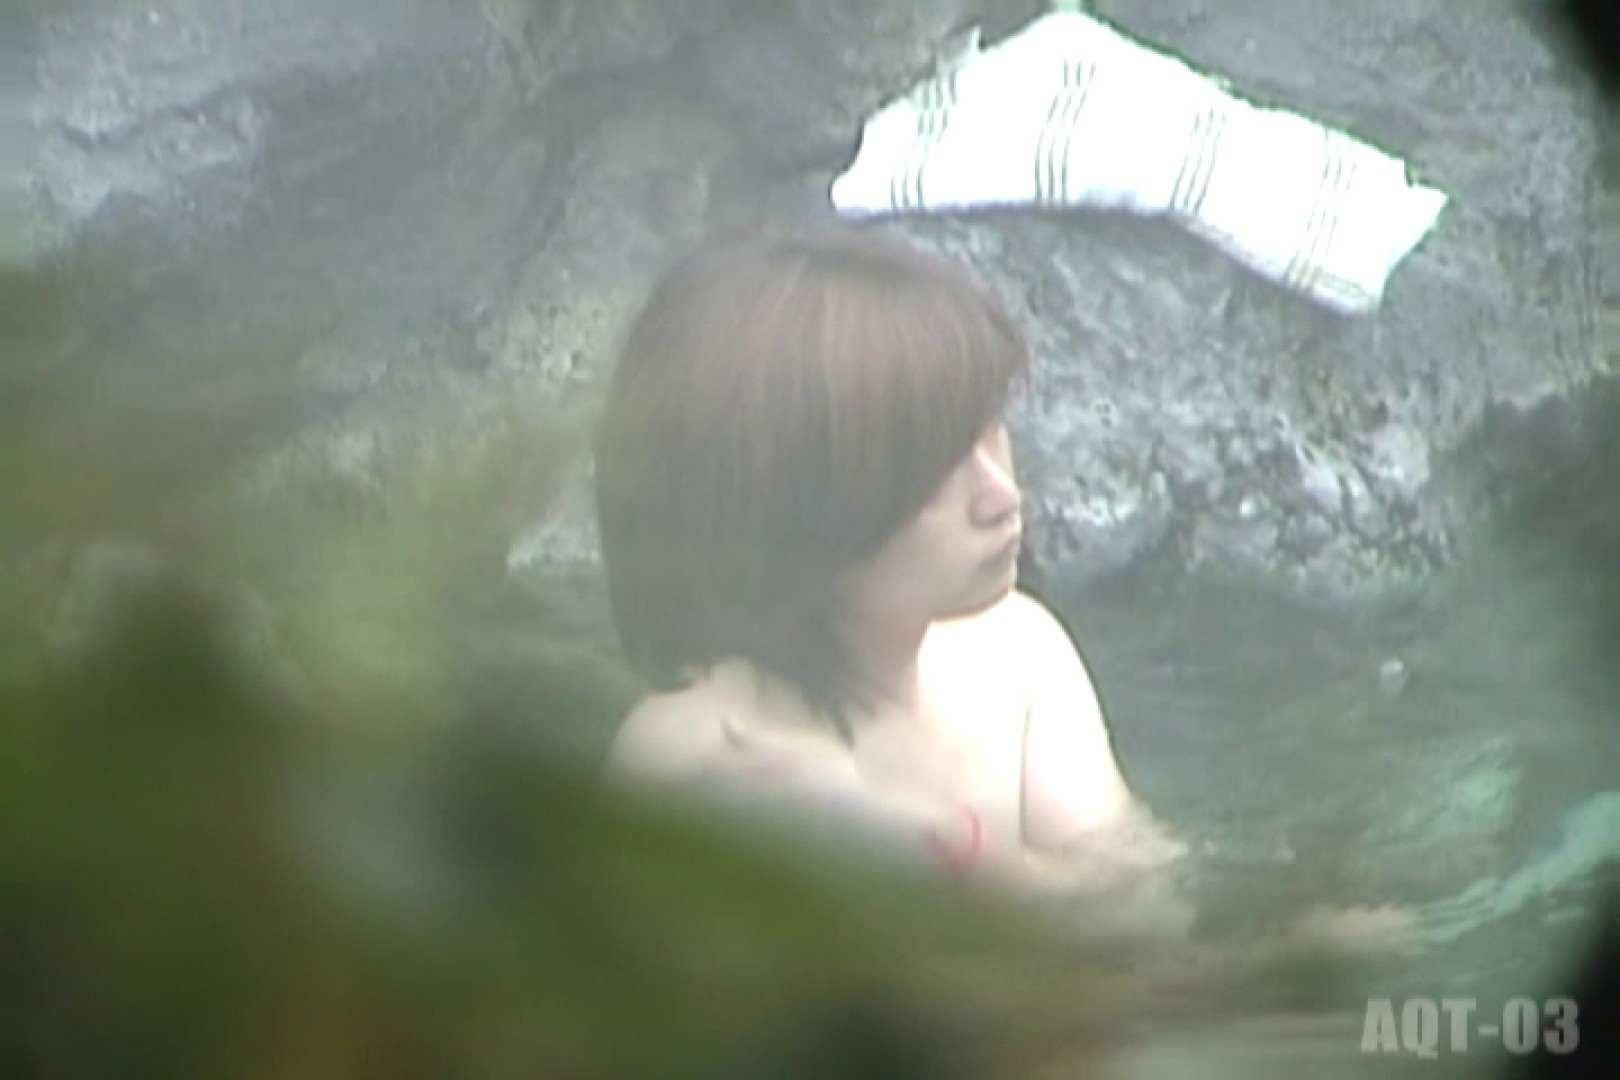 Aquaな露天風呂Vol.731 盗撮師作品  91pic 78